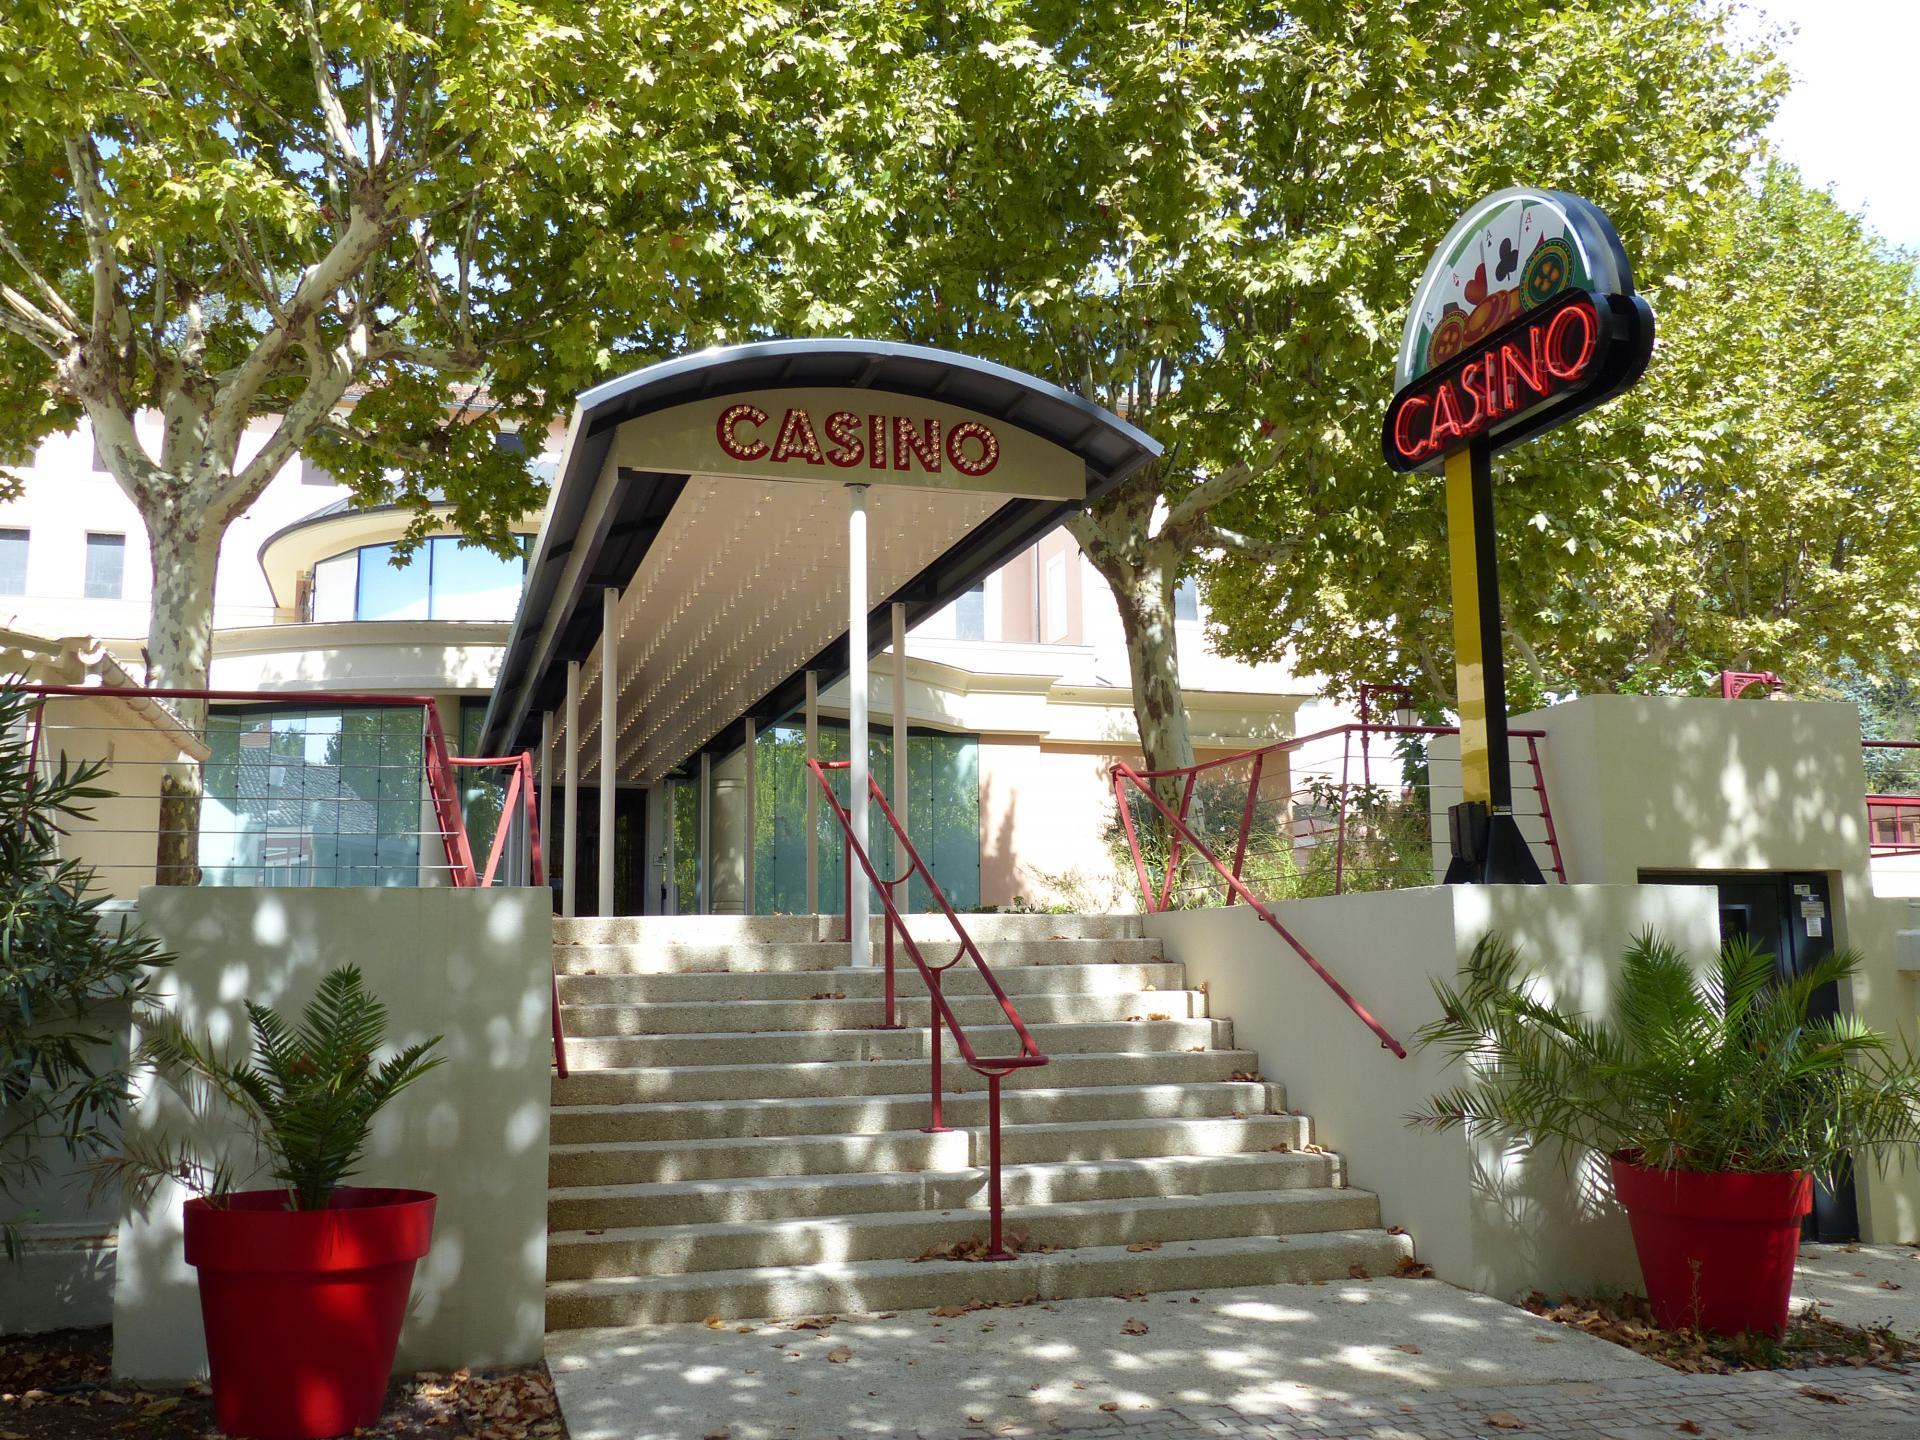 Le Casino des Fumades